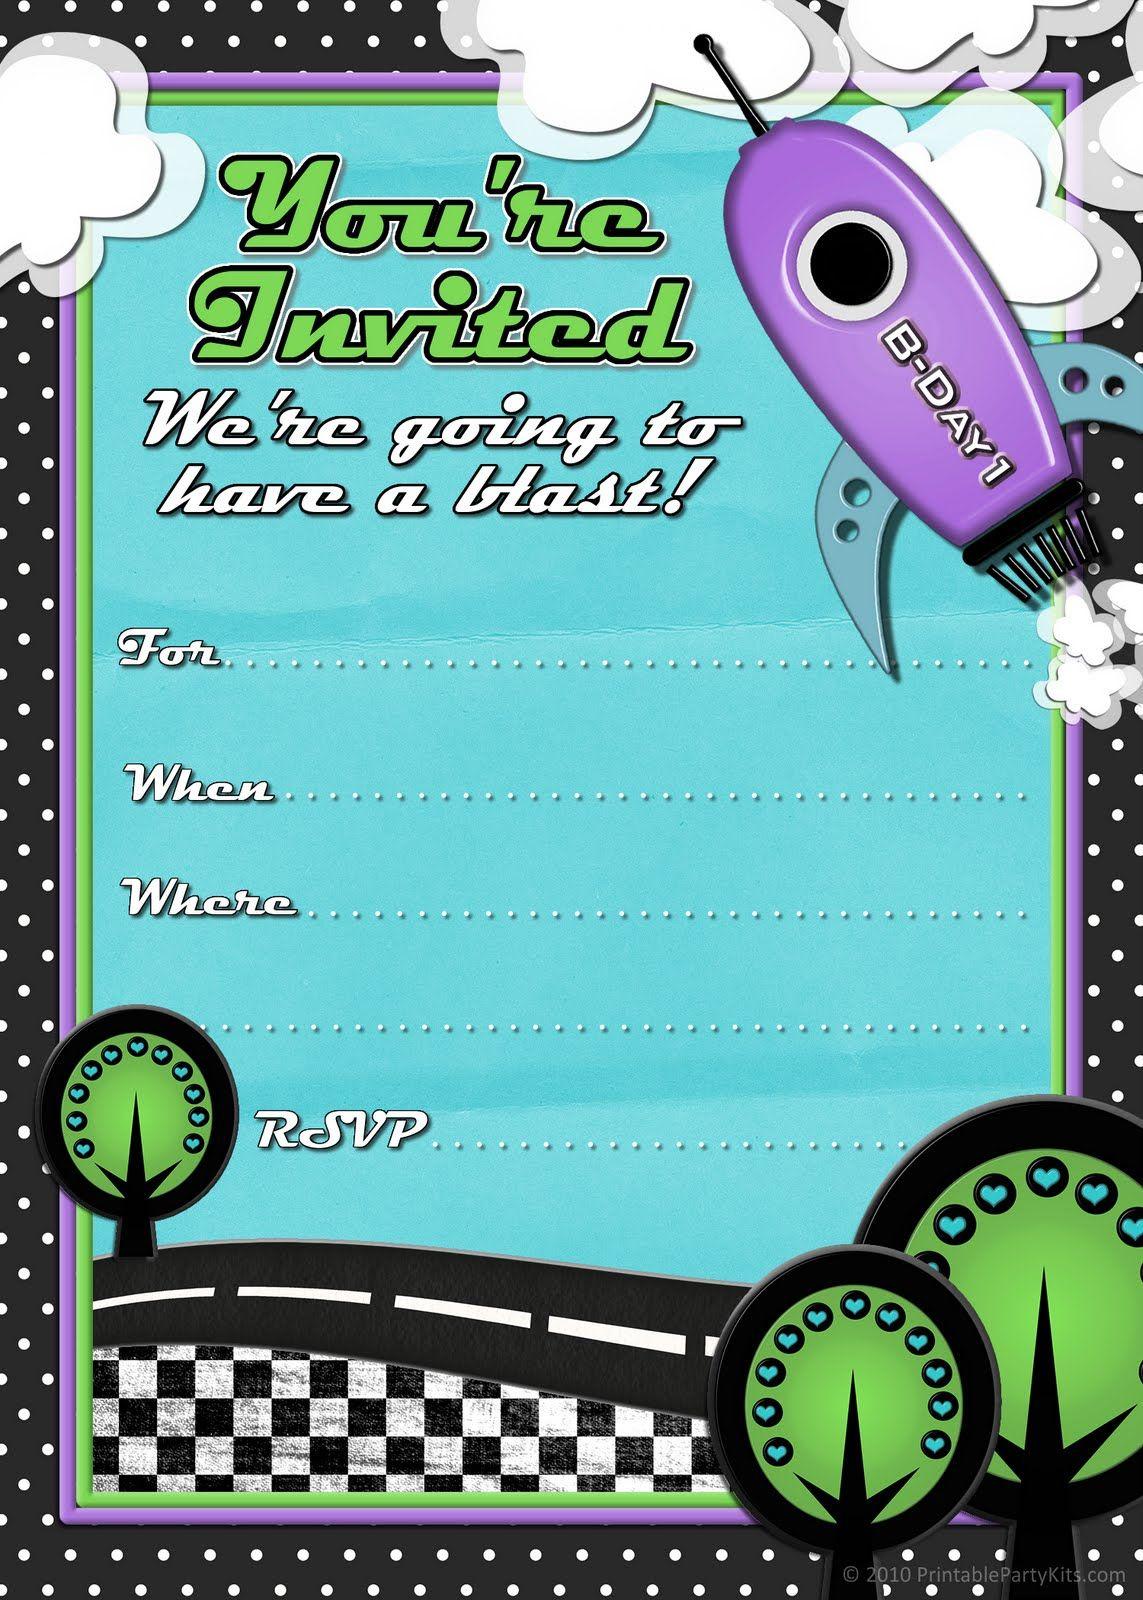 Free Printable Party Invitations Rocket Ship Birthday Invites For Boys